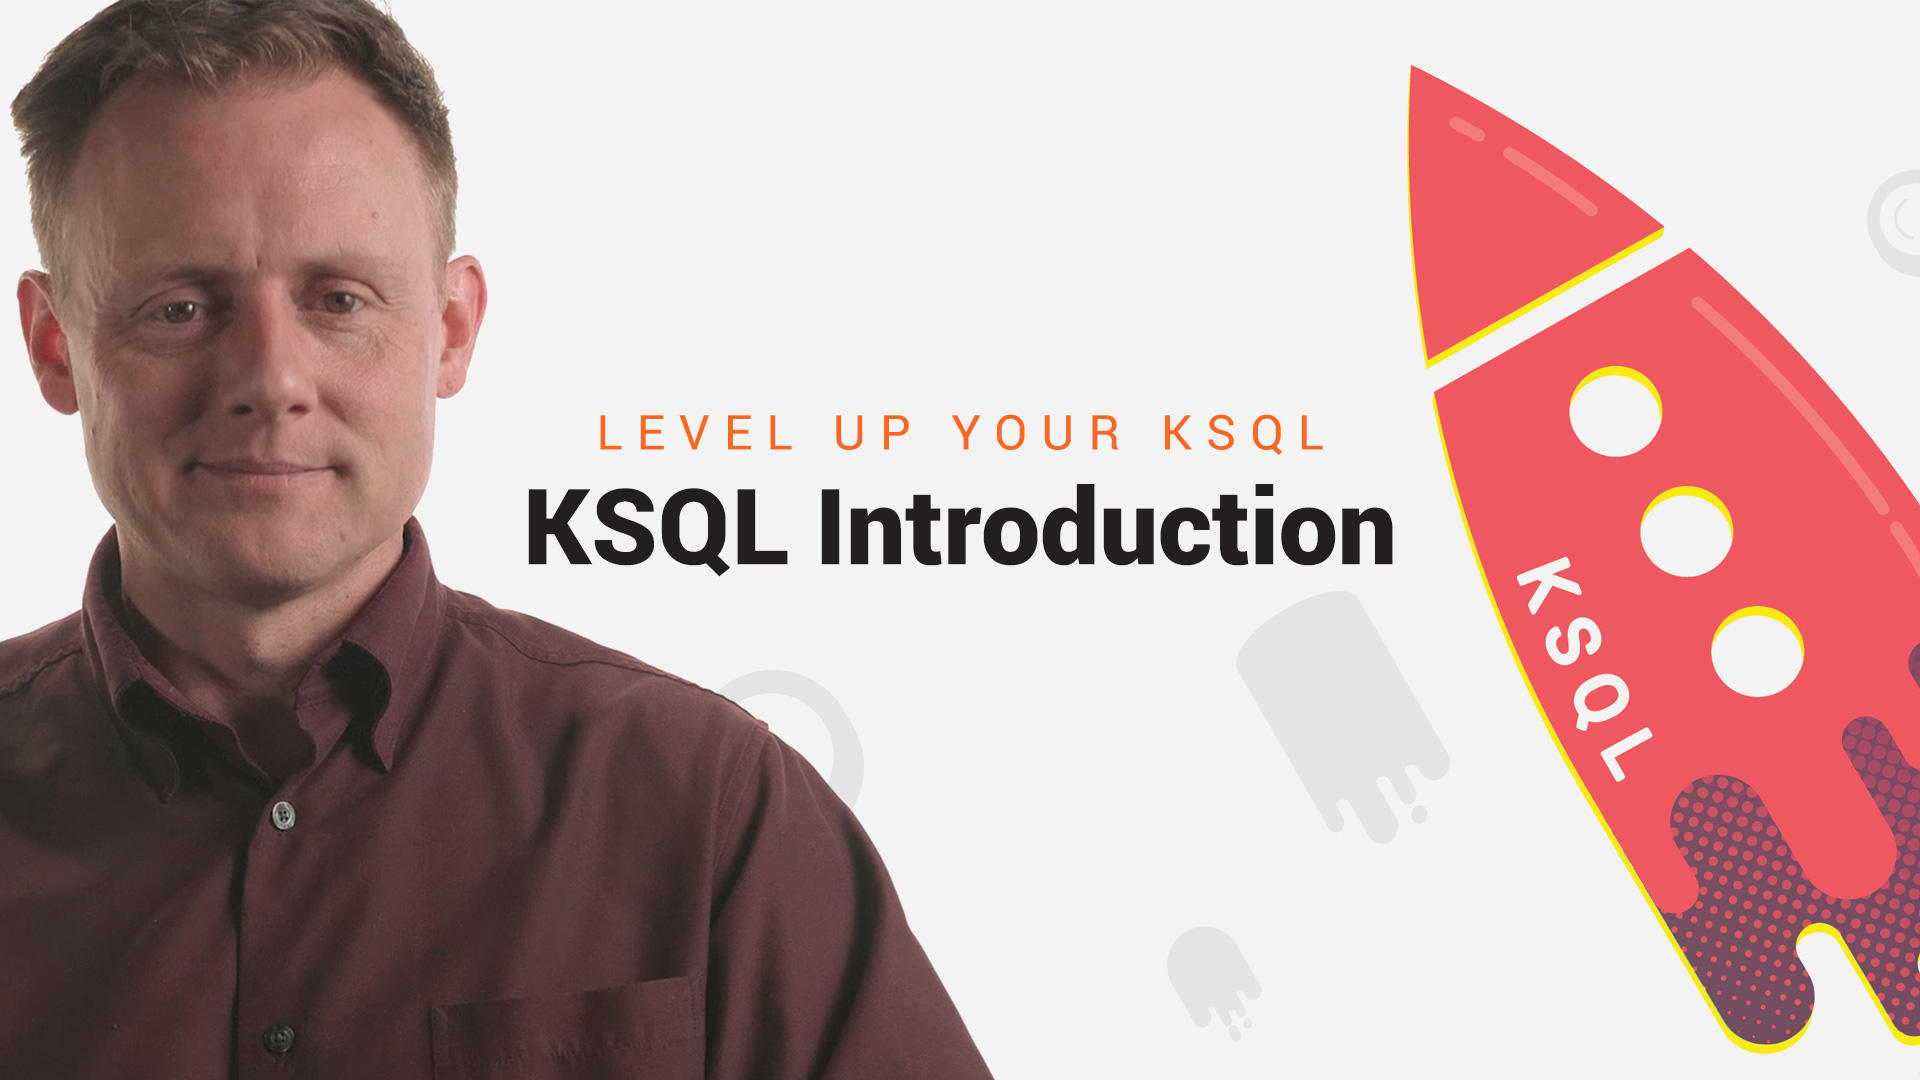 KSQL Introduction | Level Up your KSQL